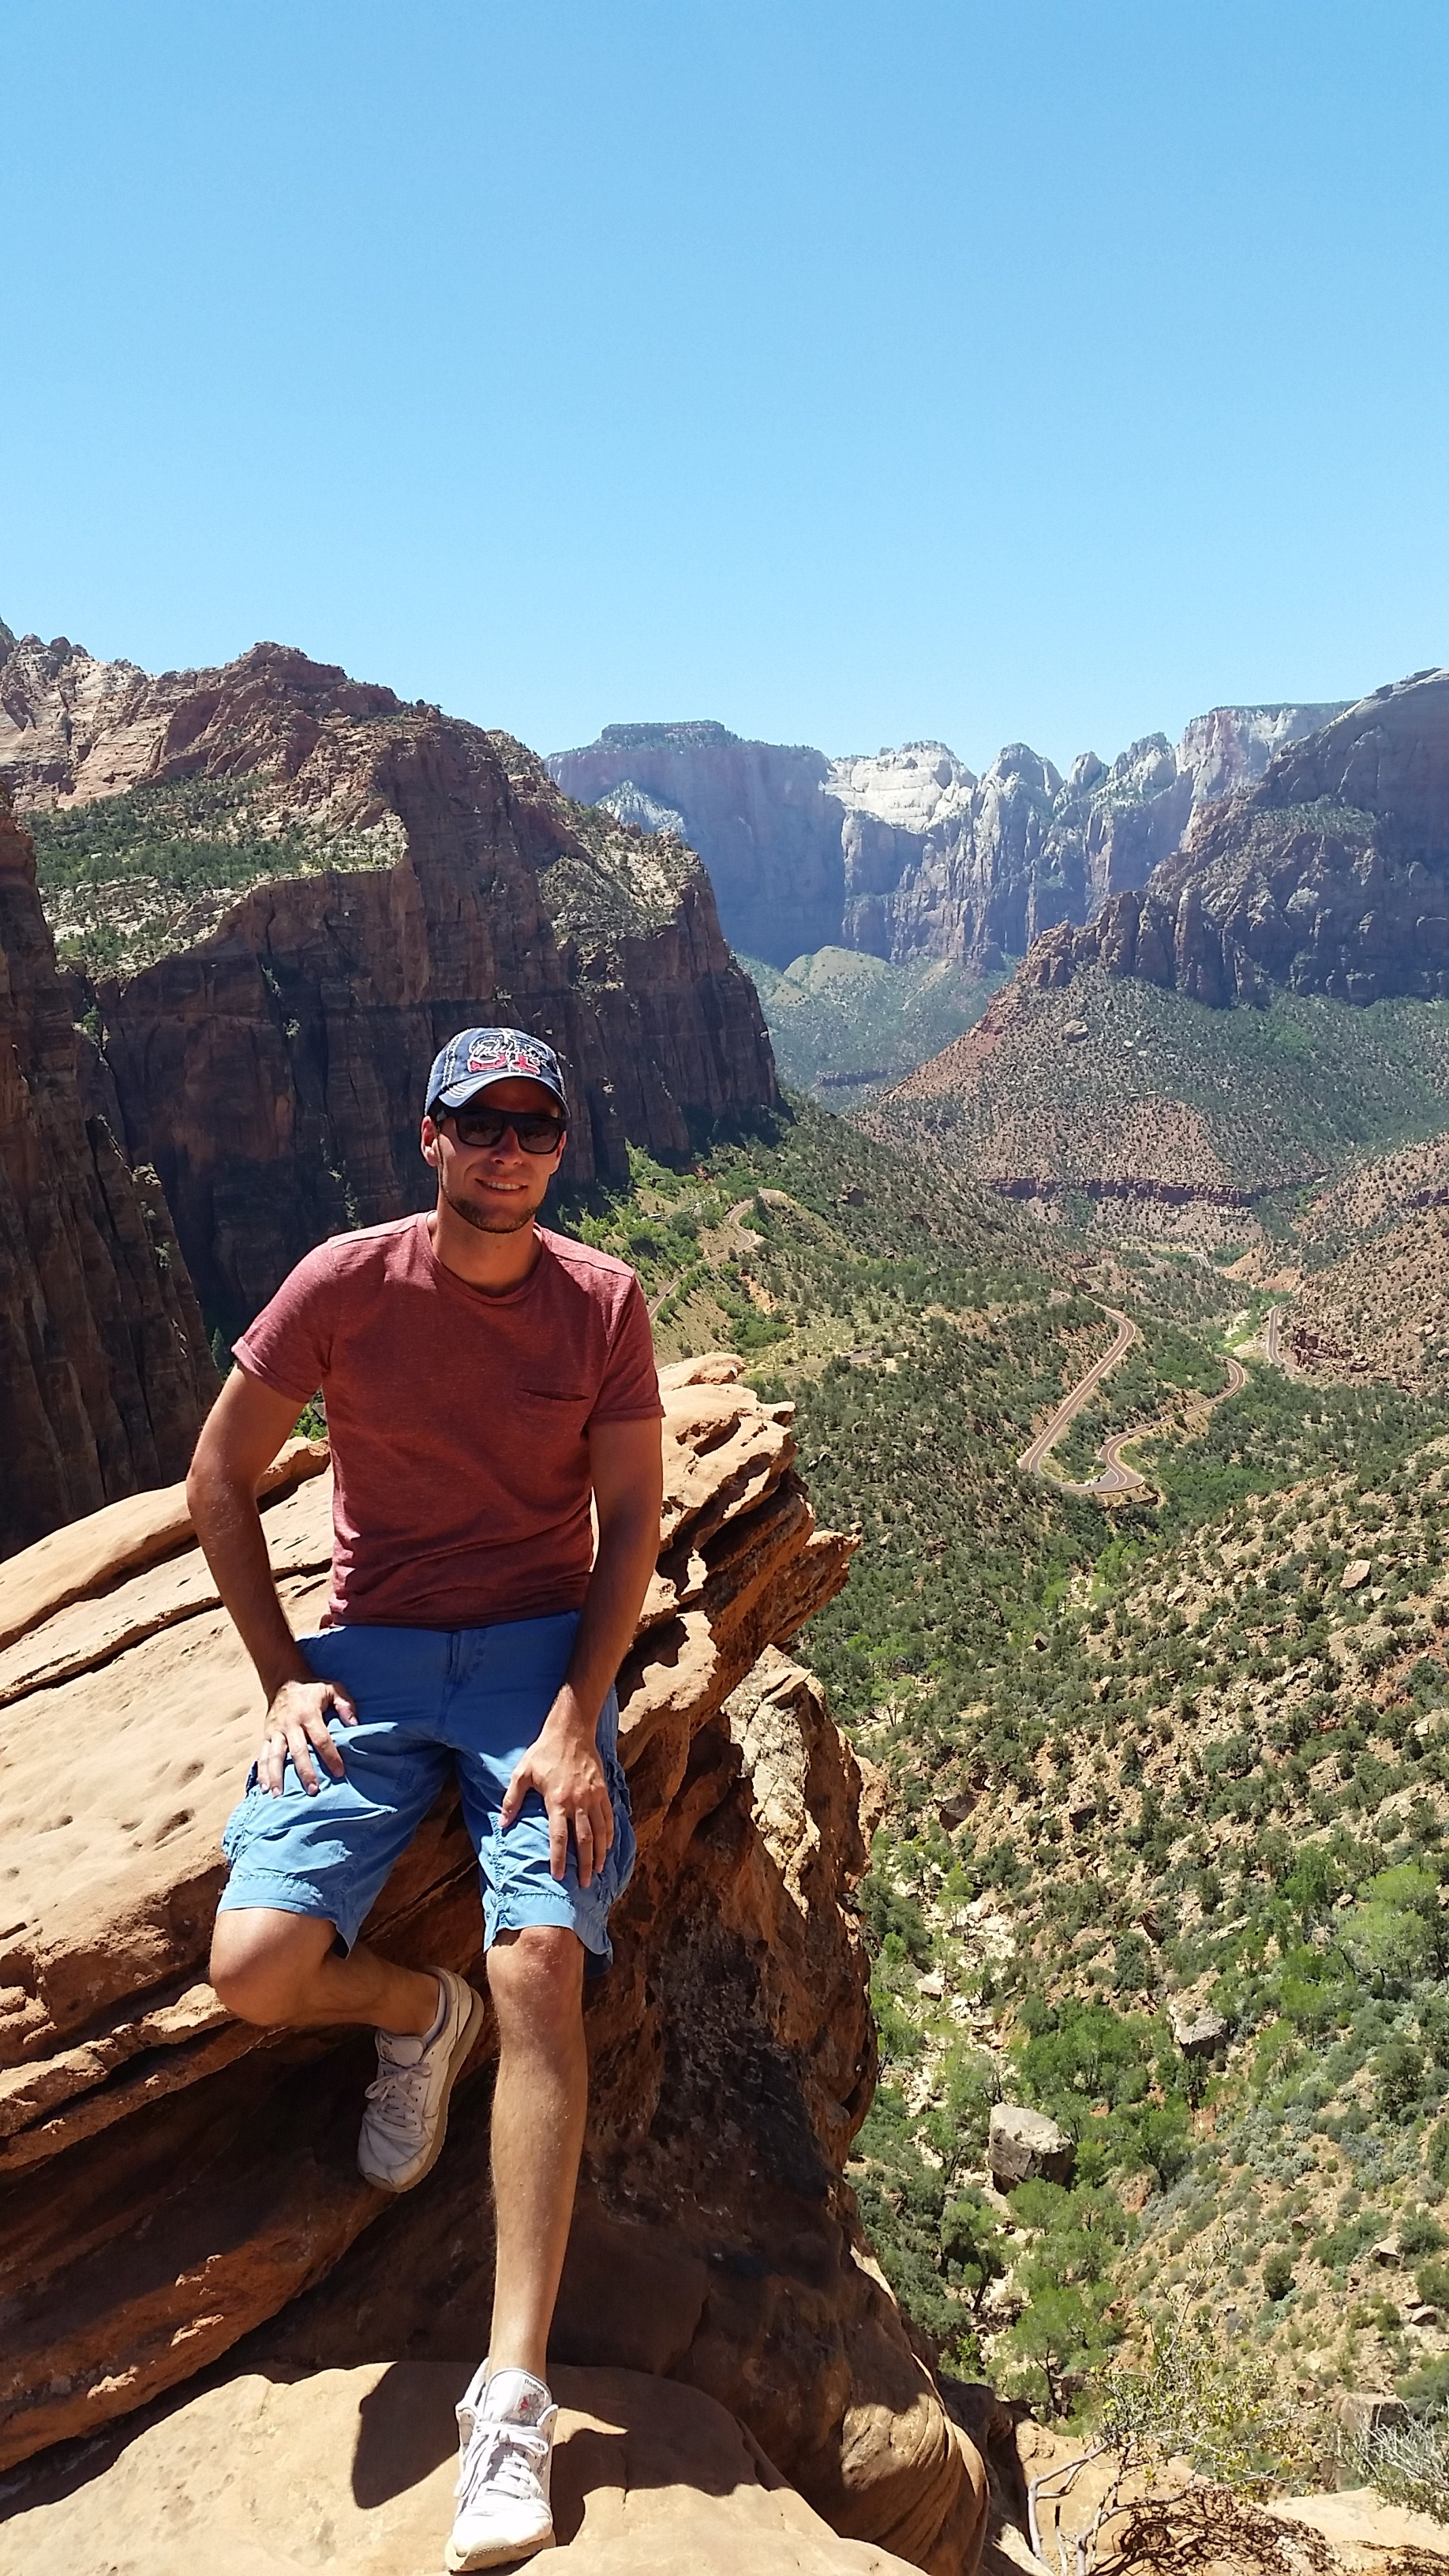 Perfekter Fotopunkt im Zion Nationalpark